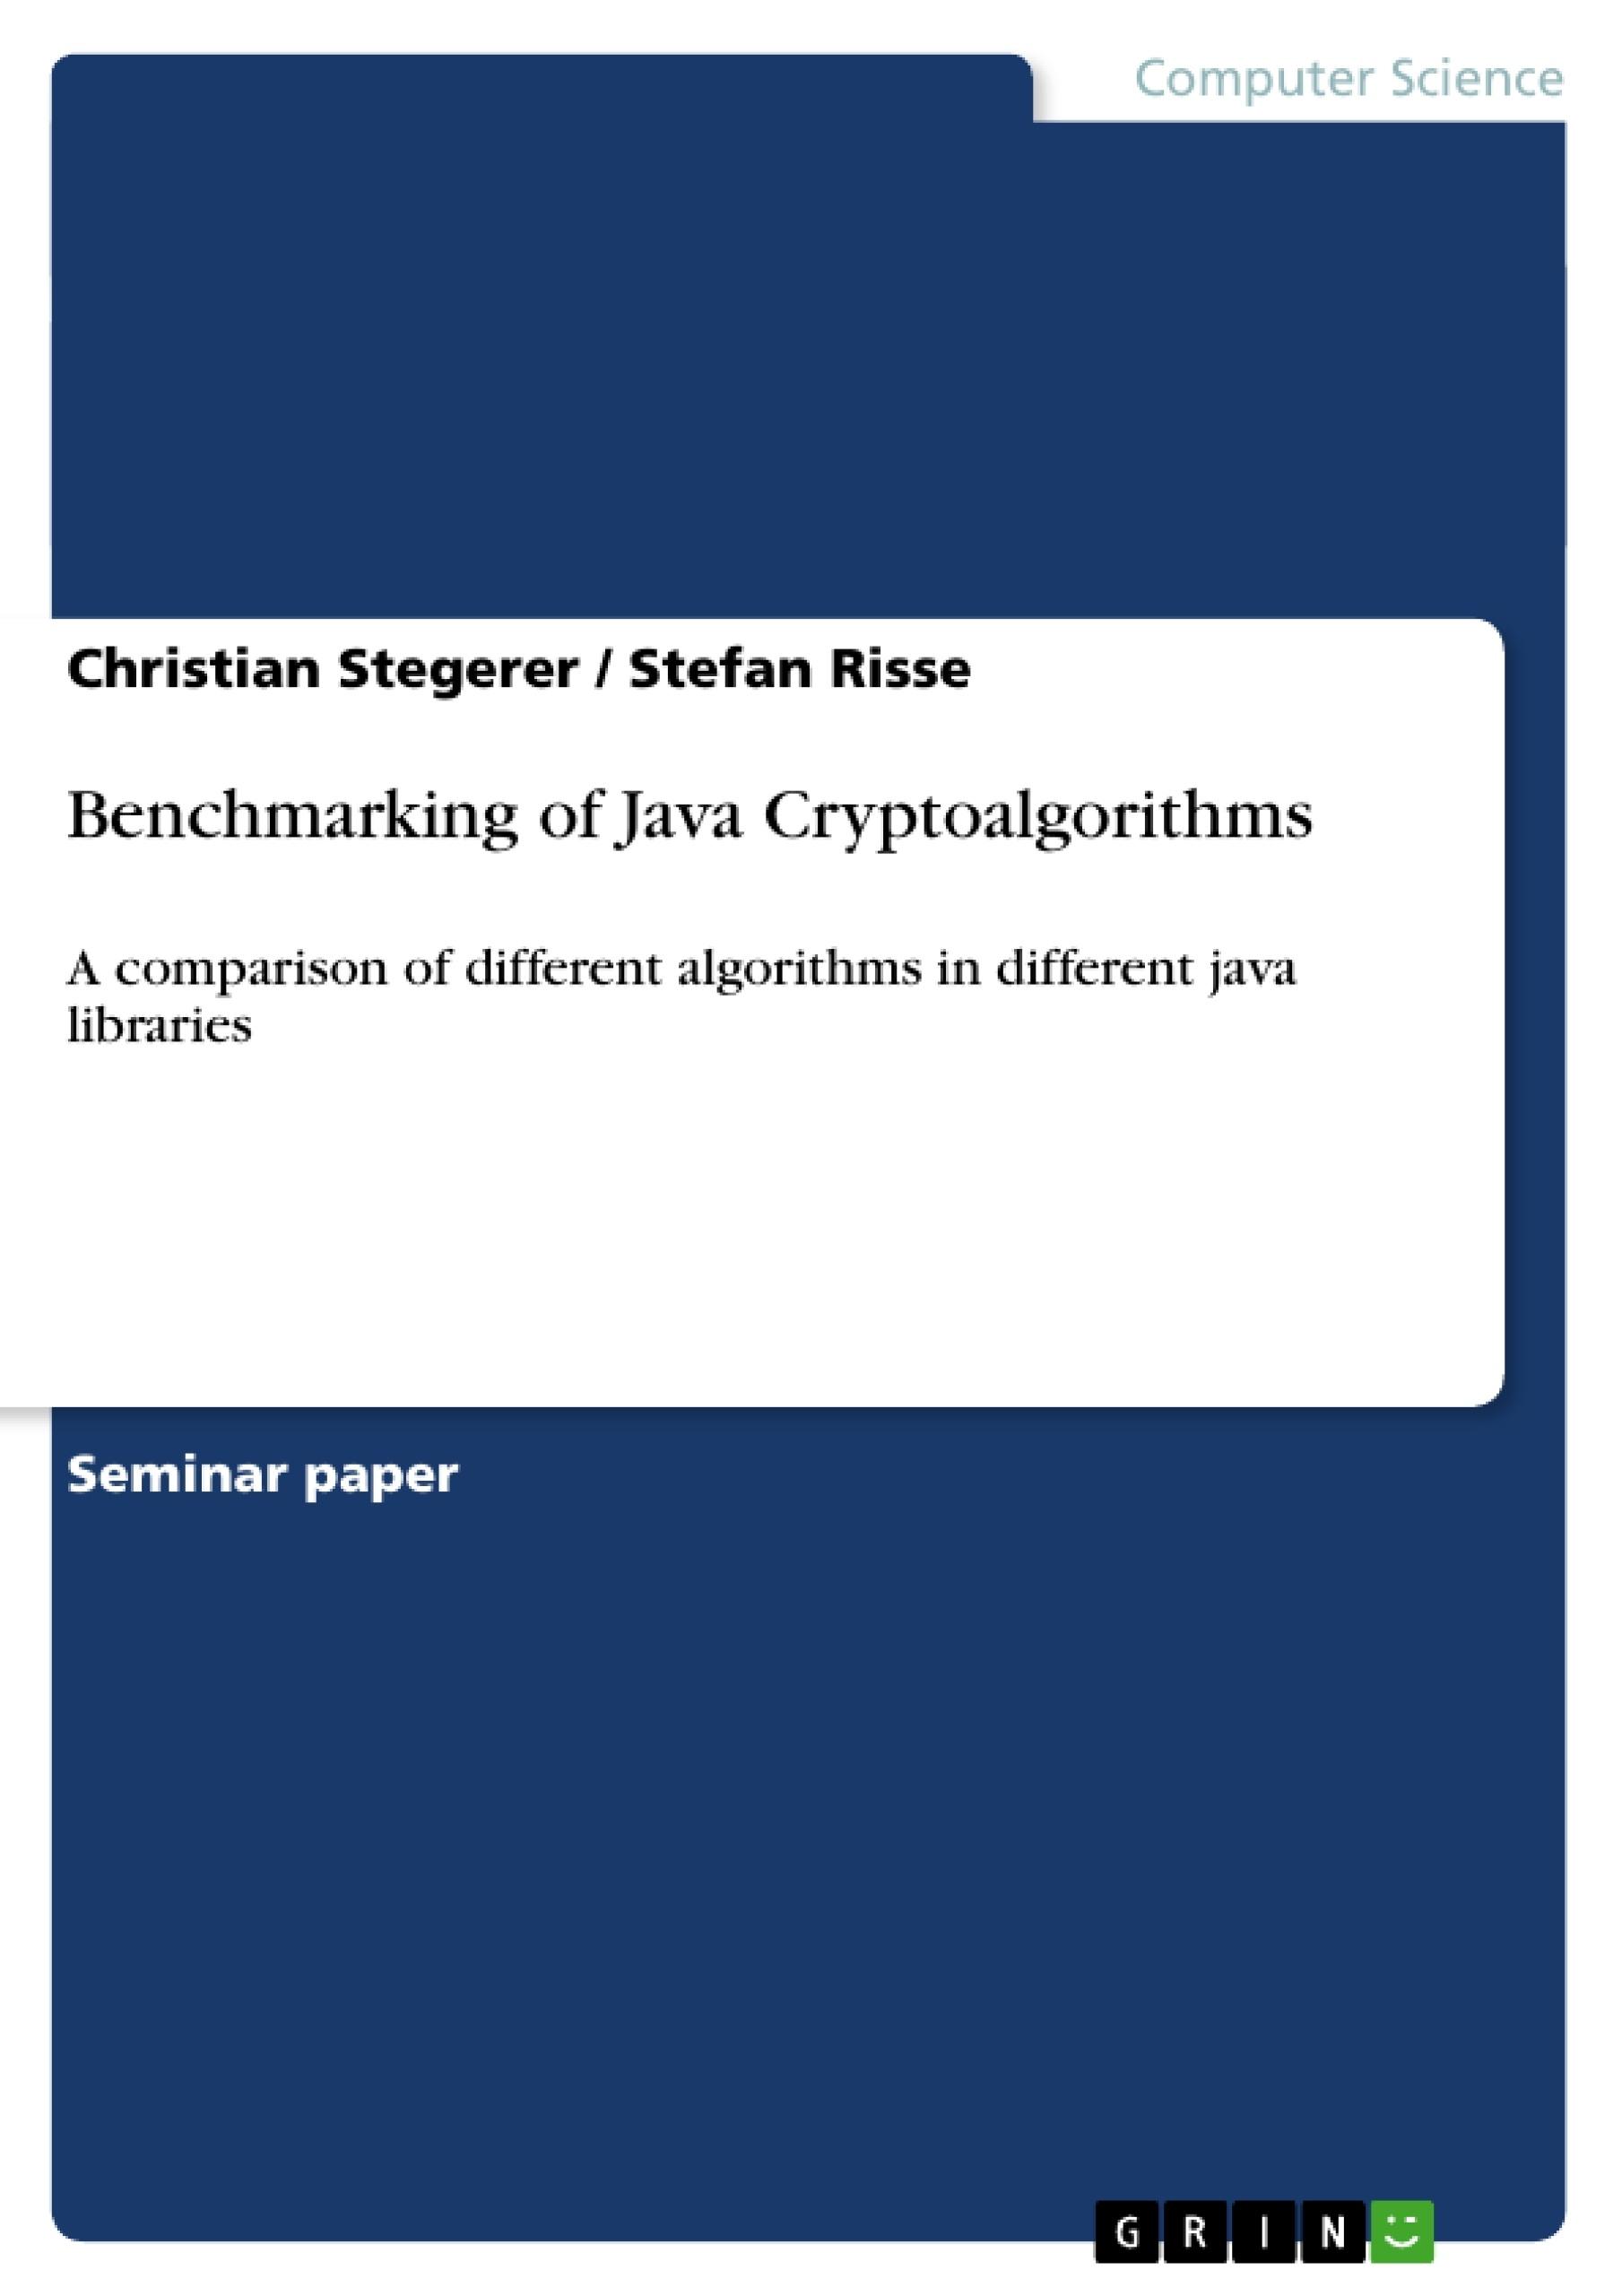 GRIN - Benchmarking of Java Cryptoalgorithms